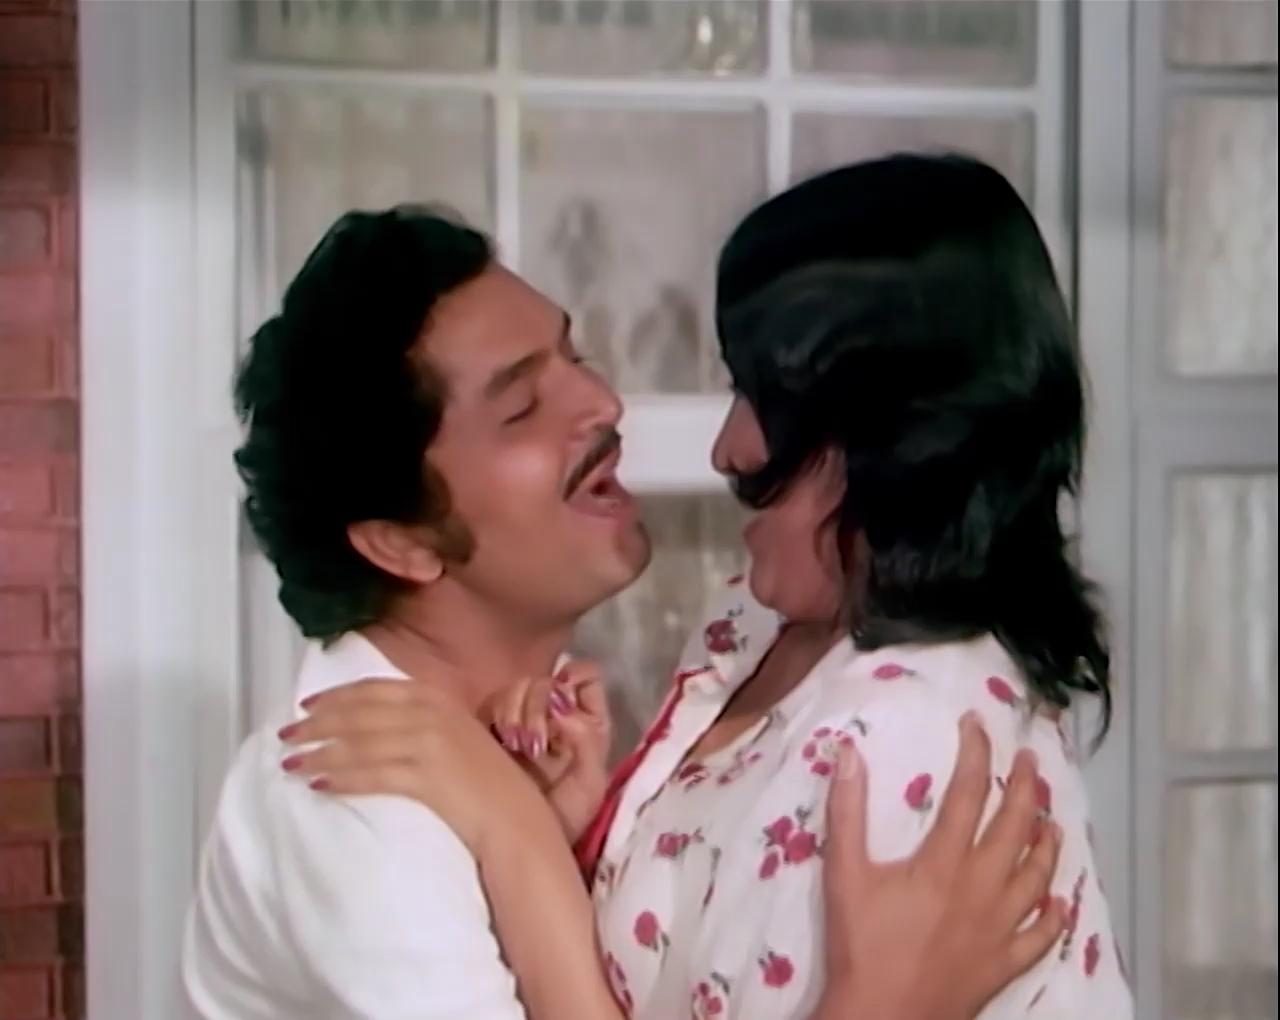 Aashiq.Hoon.Baharon.Ka.1977.WEBRip.AVC.AAC.1080p_DusIcTv[(029502)07-18-49].JPG